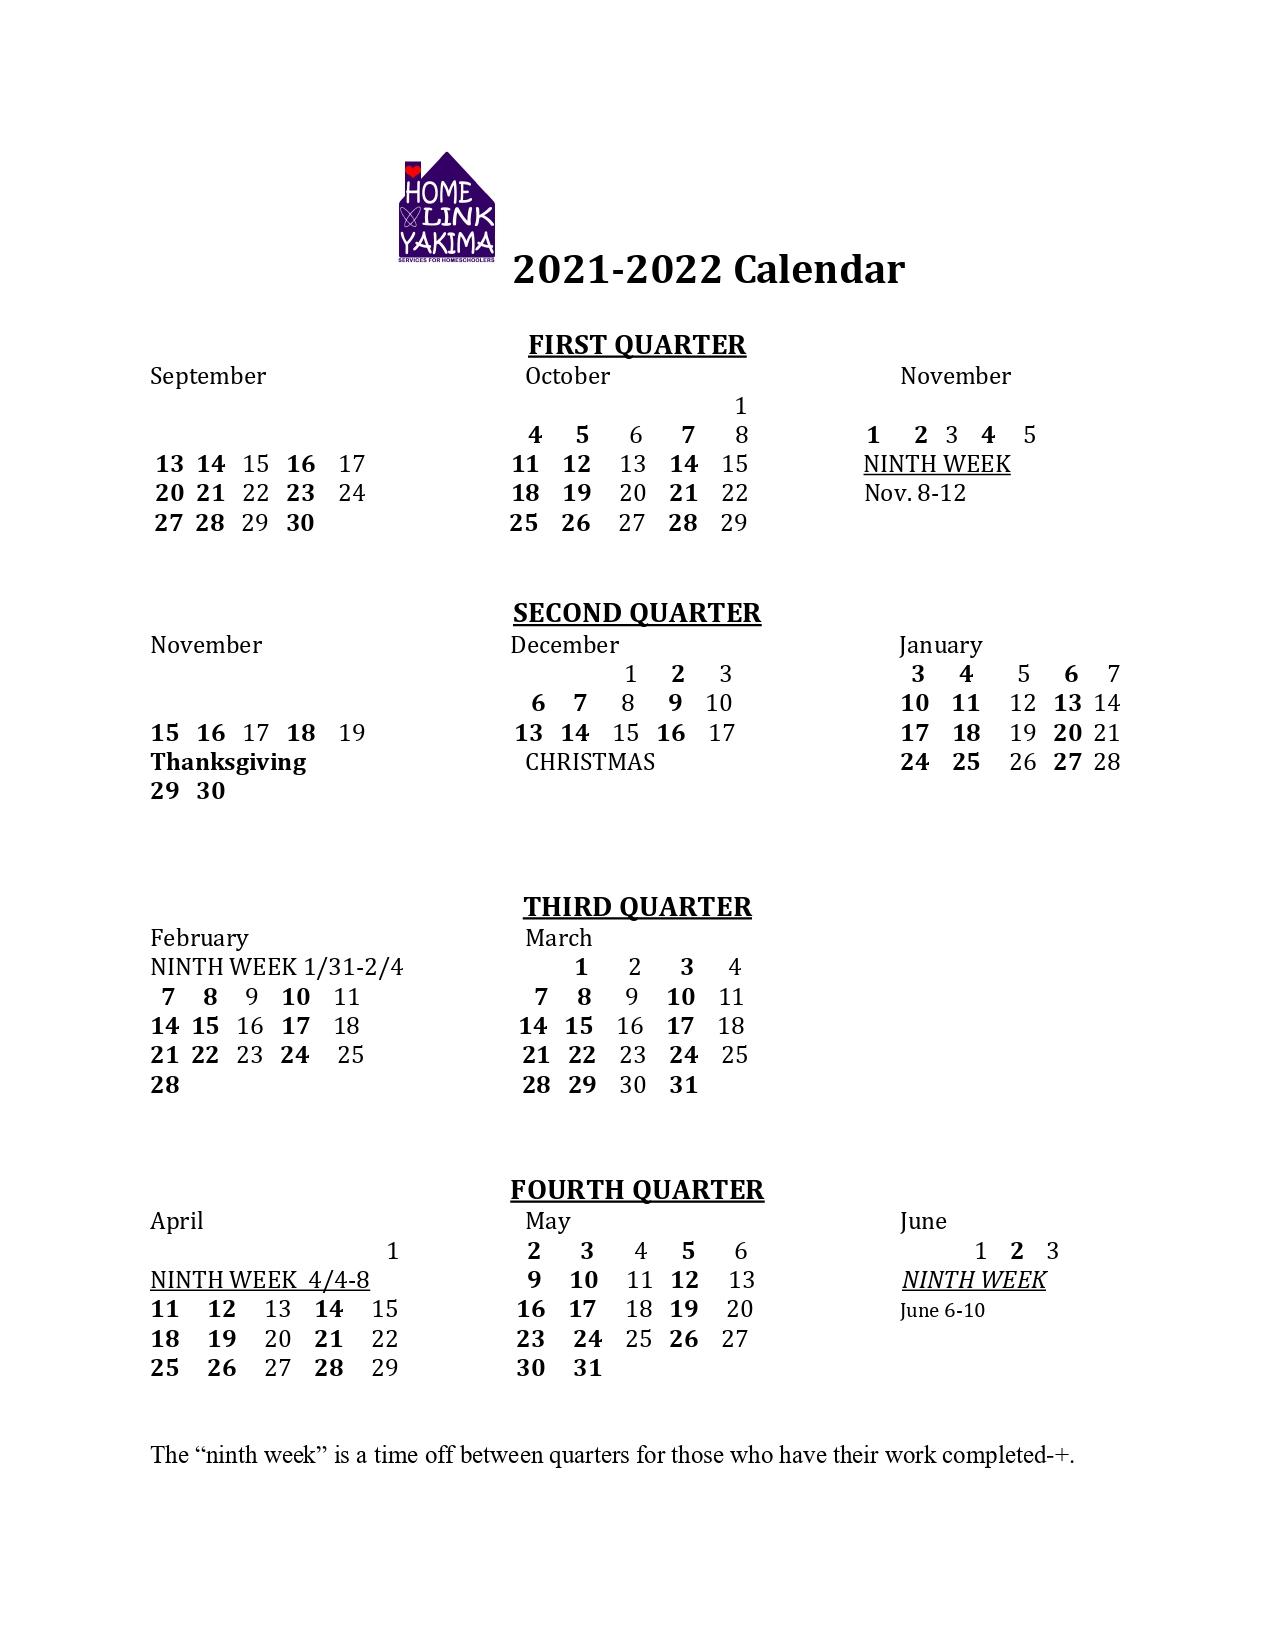 HL final calendar 21-22_page-0001 (1)